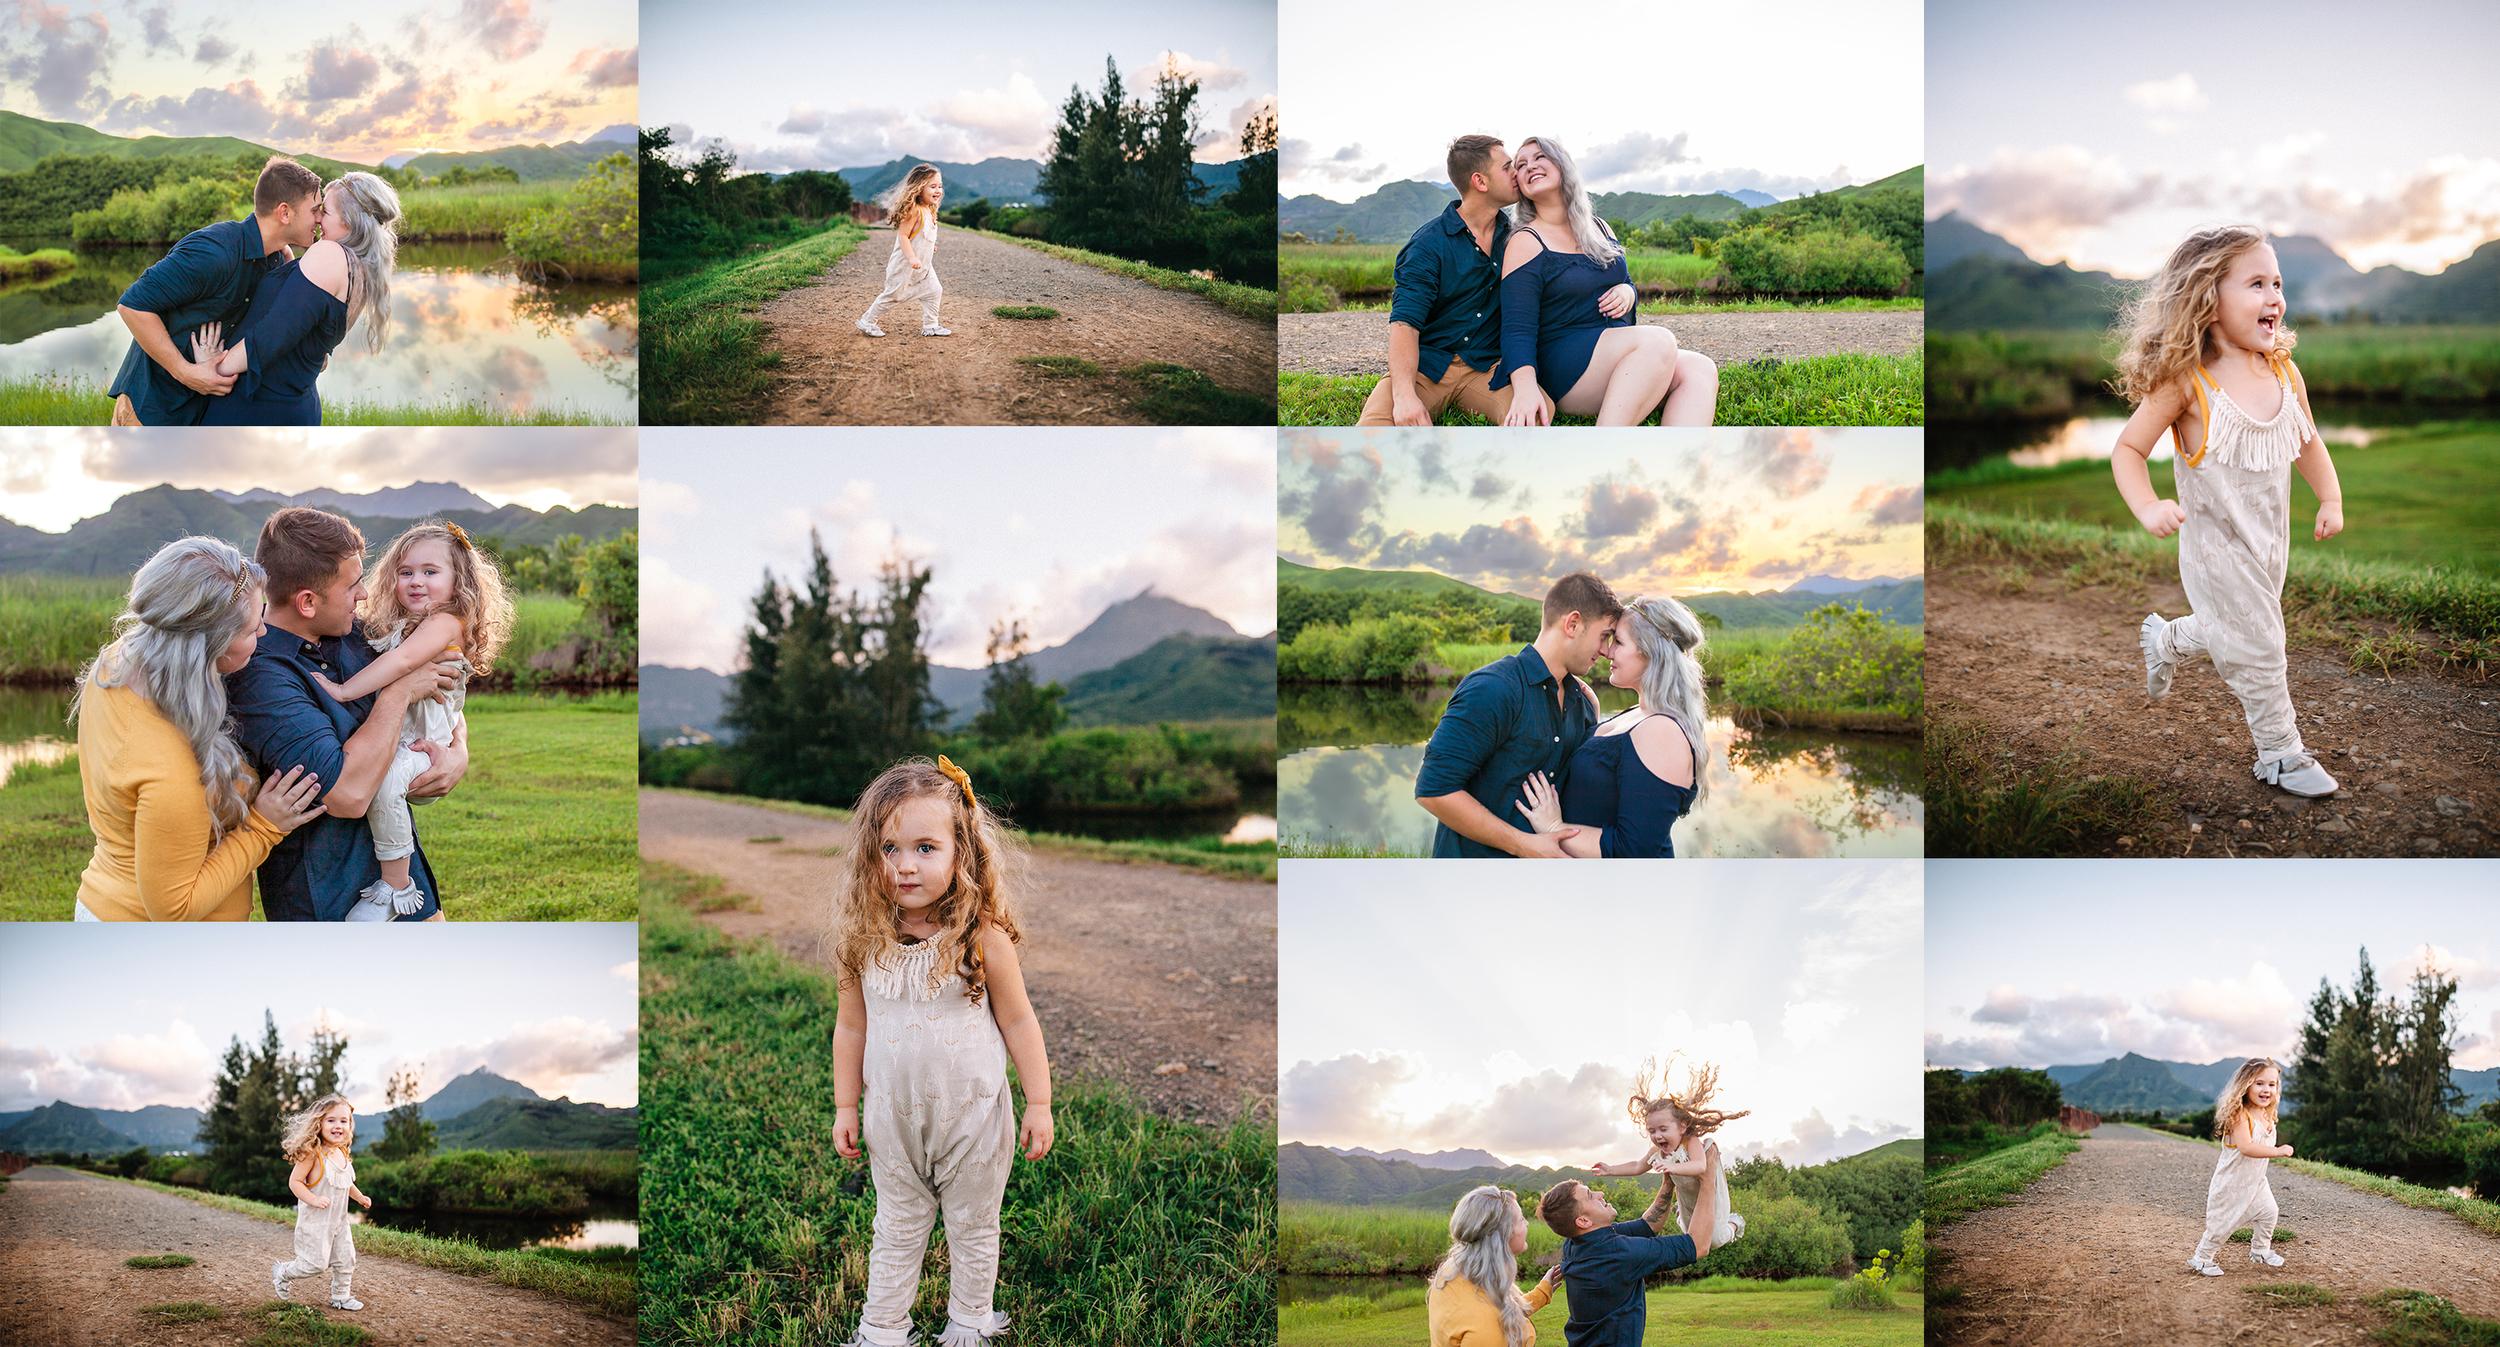 Julie Dunlap. Family photography. Oahu hawaii.jpg